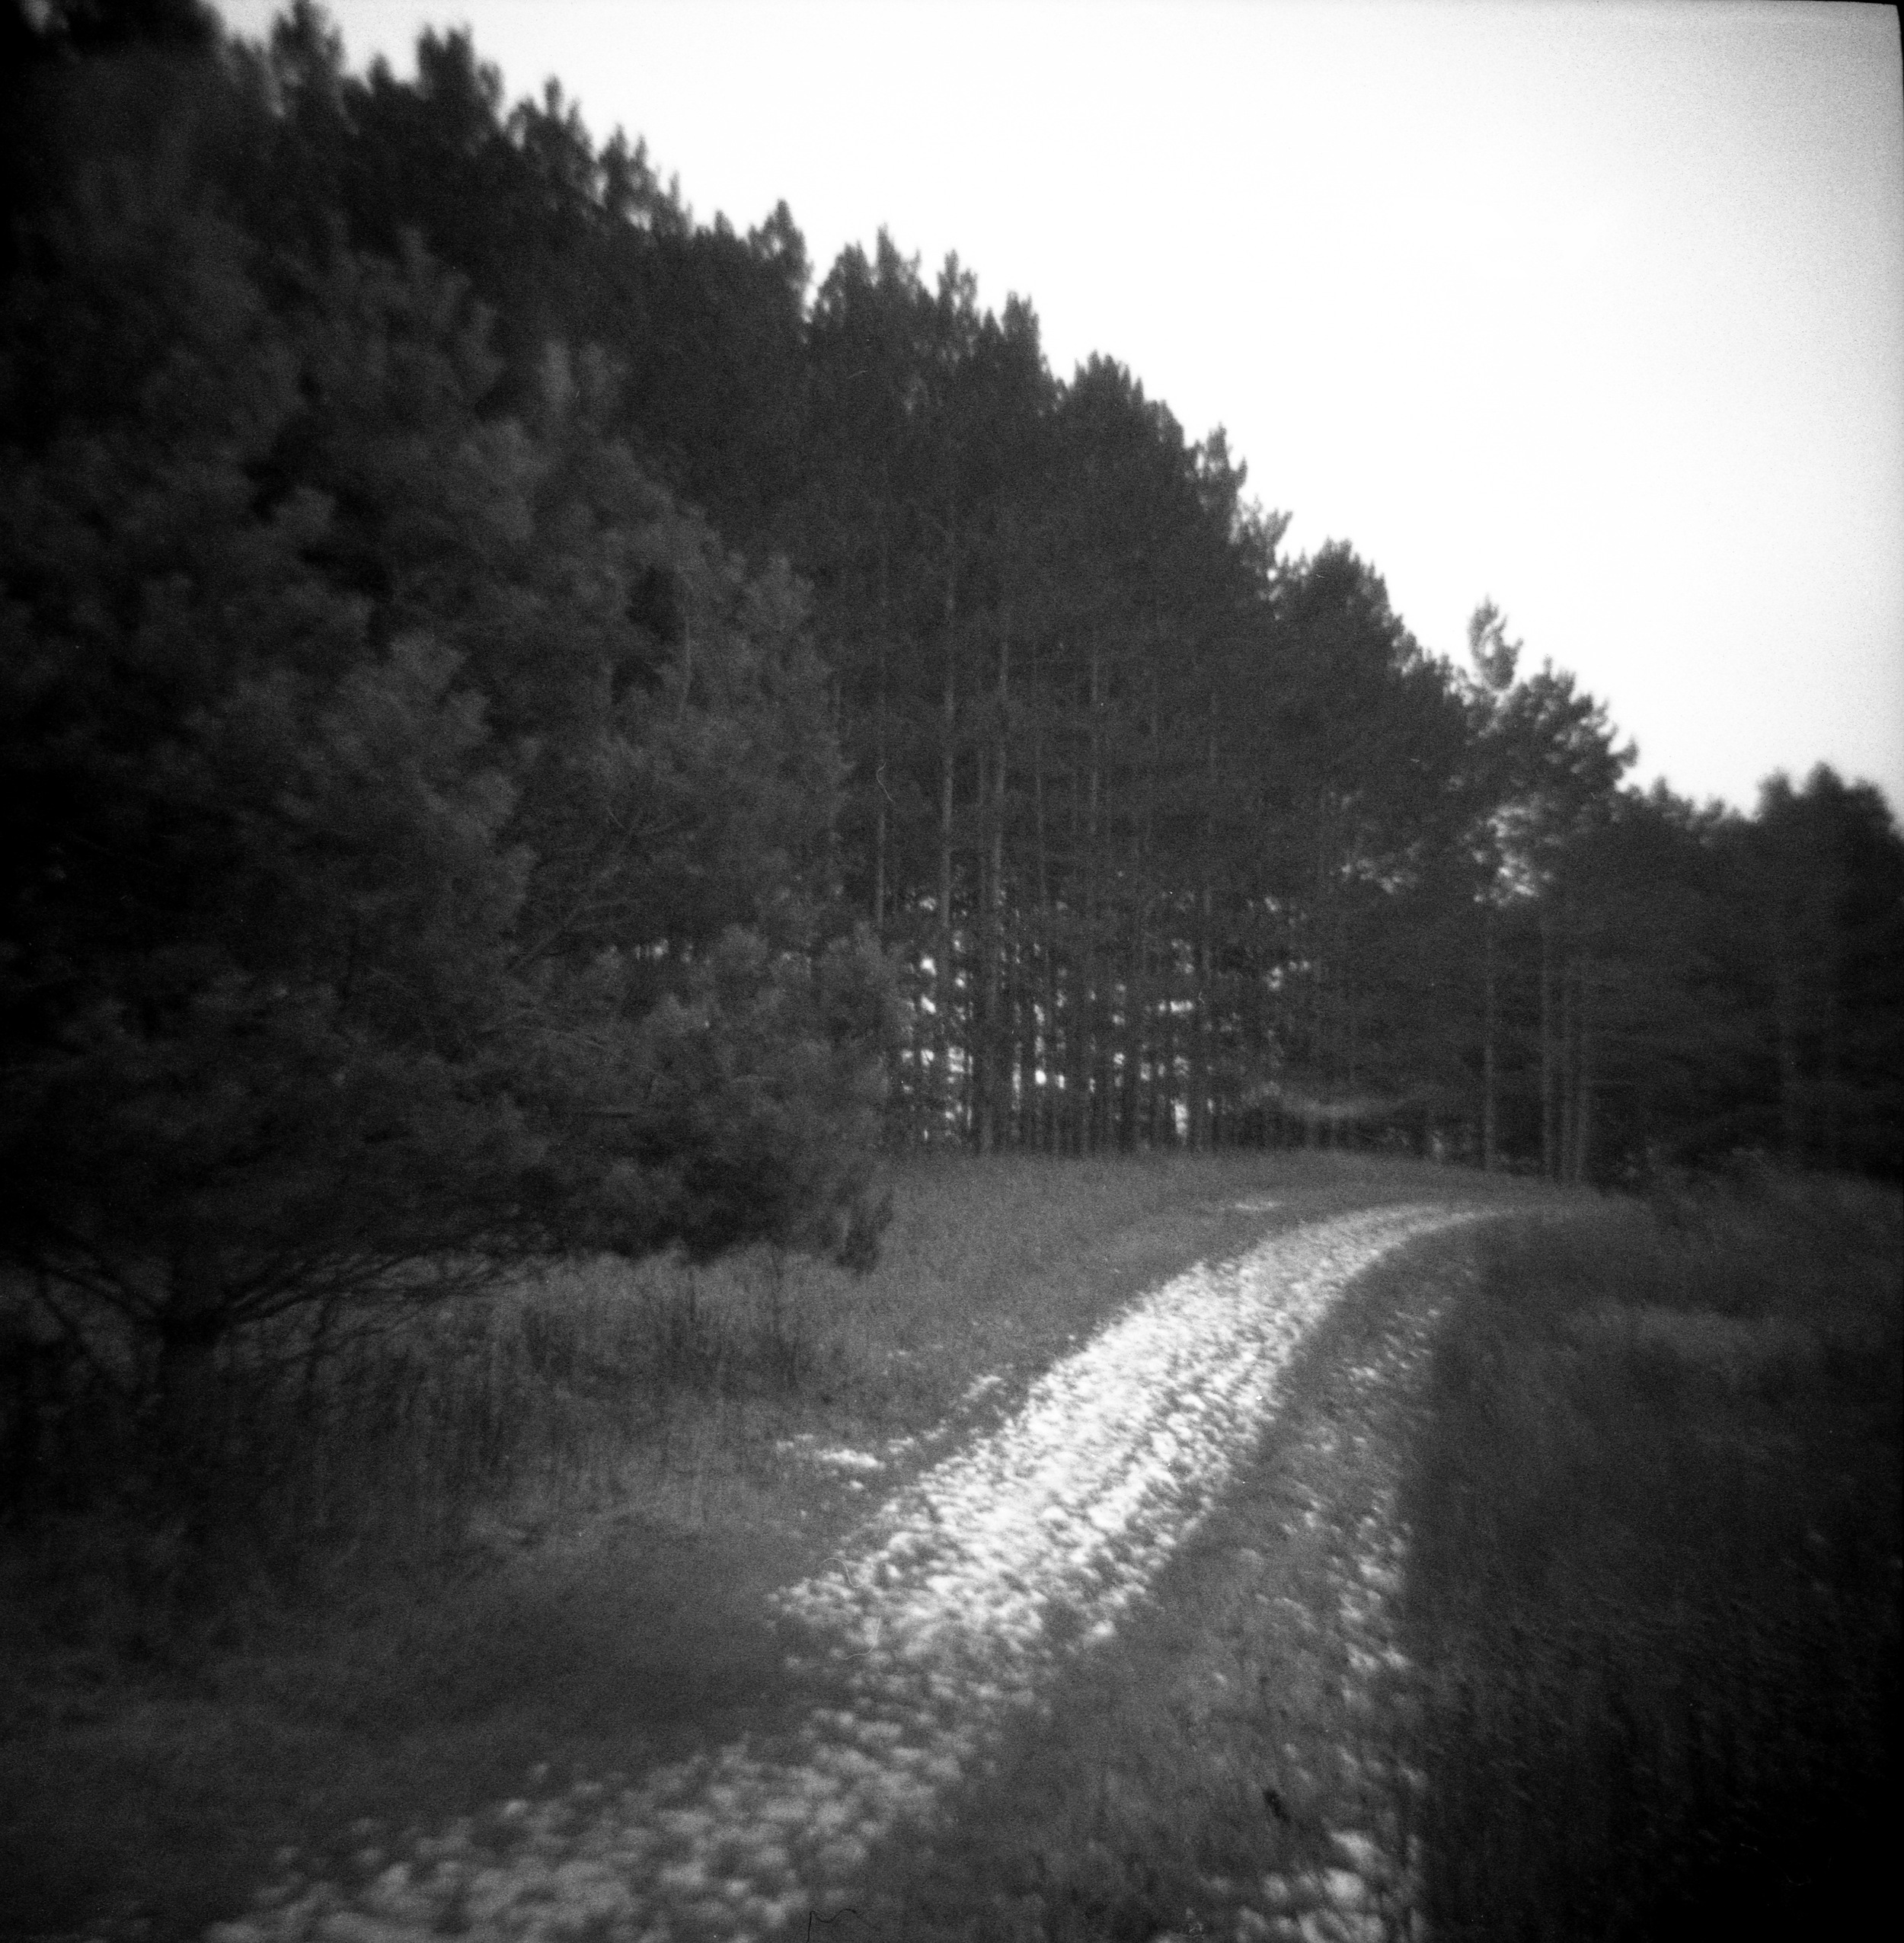 The Trail_edited-1.jpg